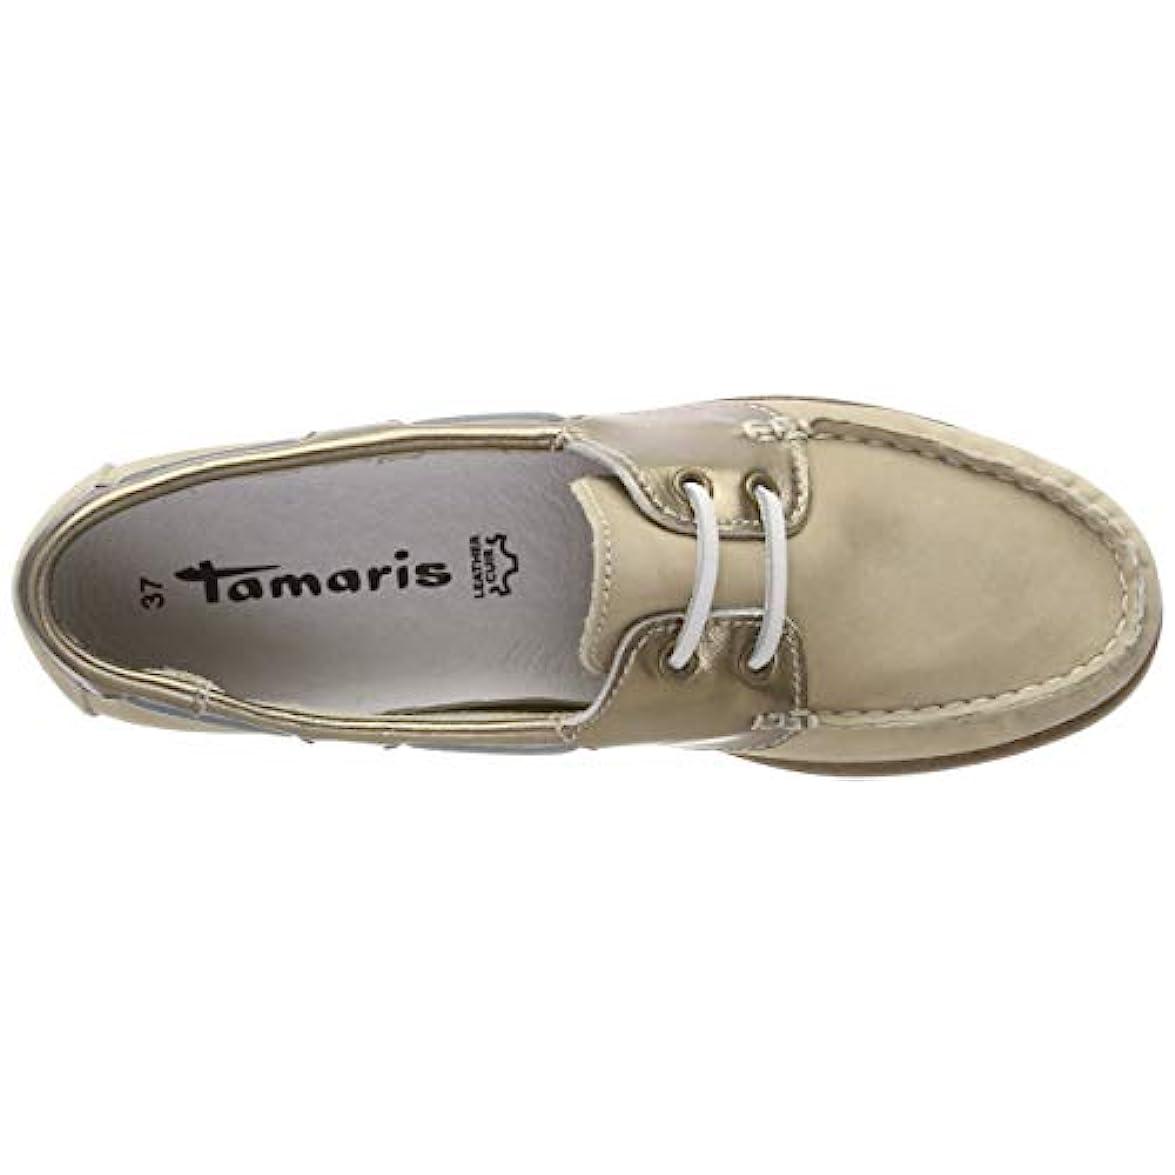 Tamaris 1-1-23616-22 489 Scarpe Da Ginnastica Basse Donna